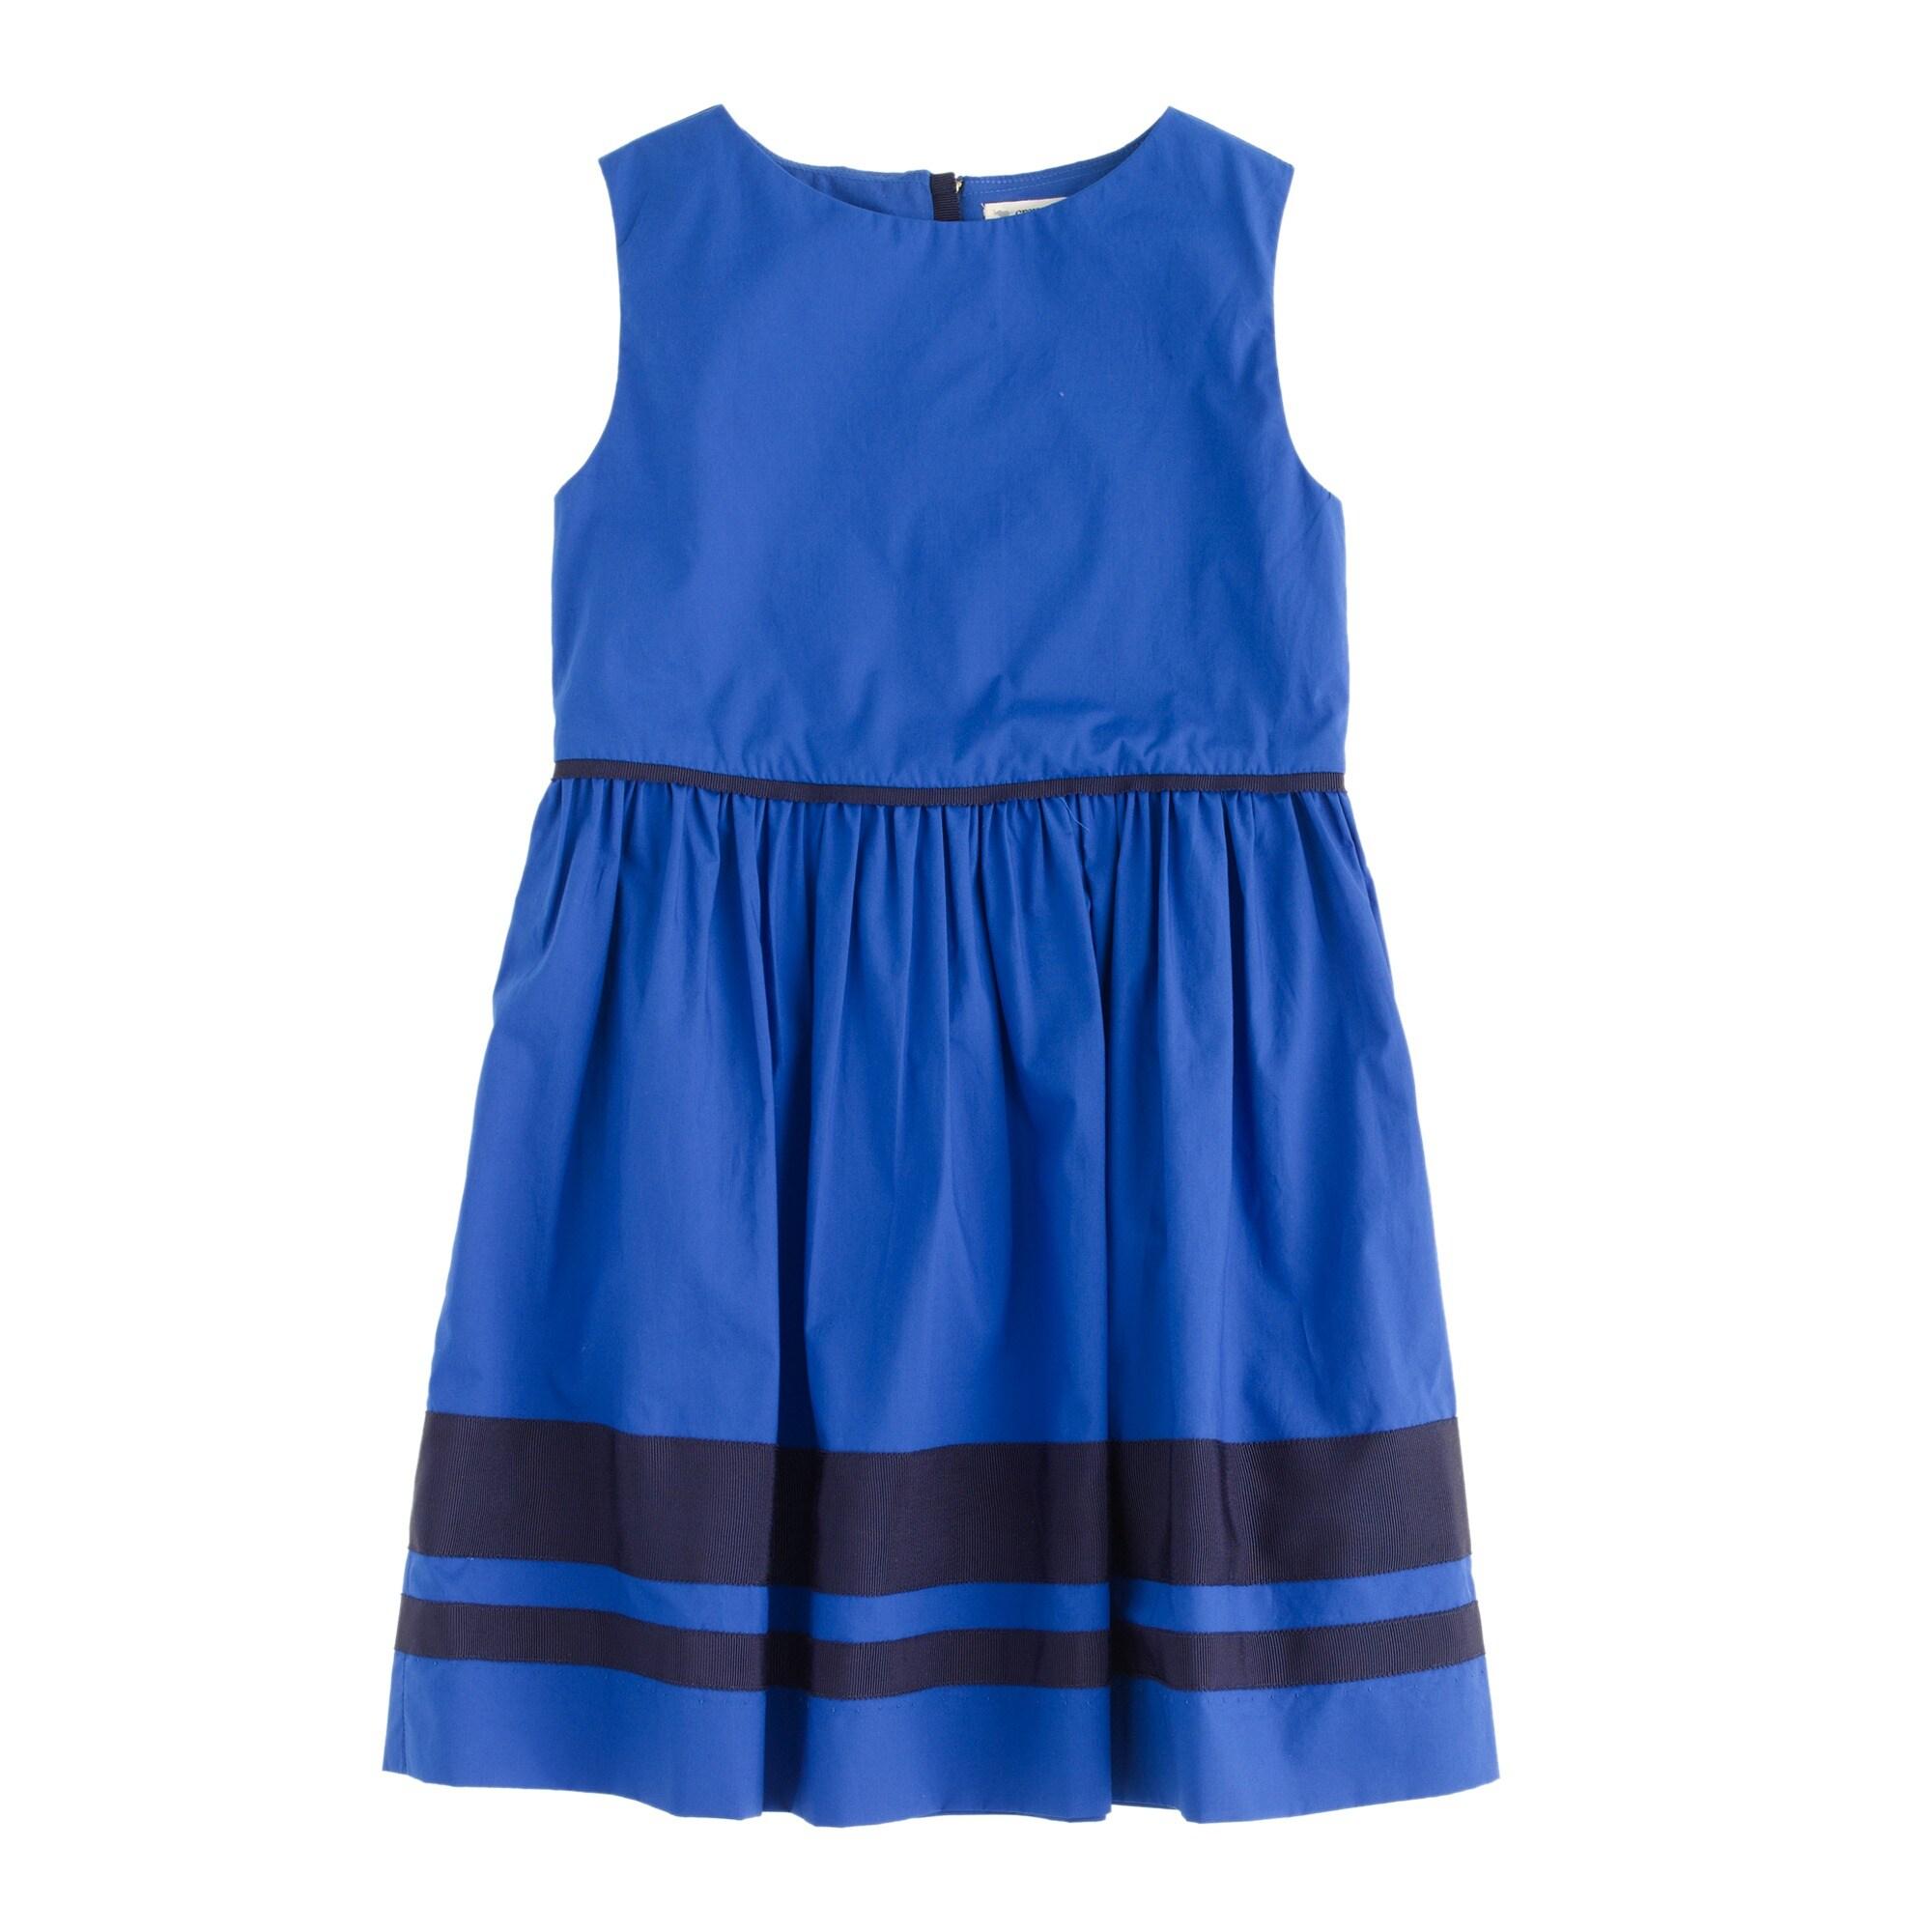 Girls' grosgrain stripe dress